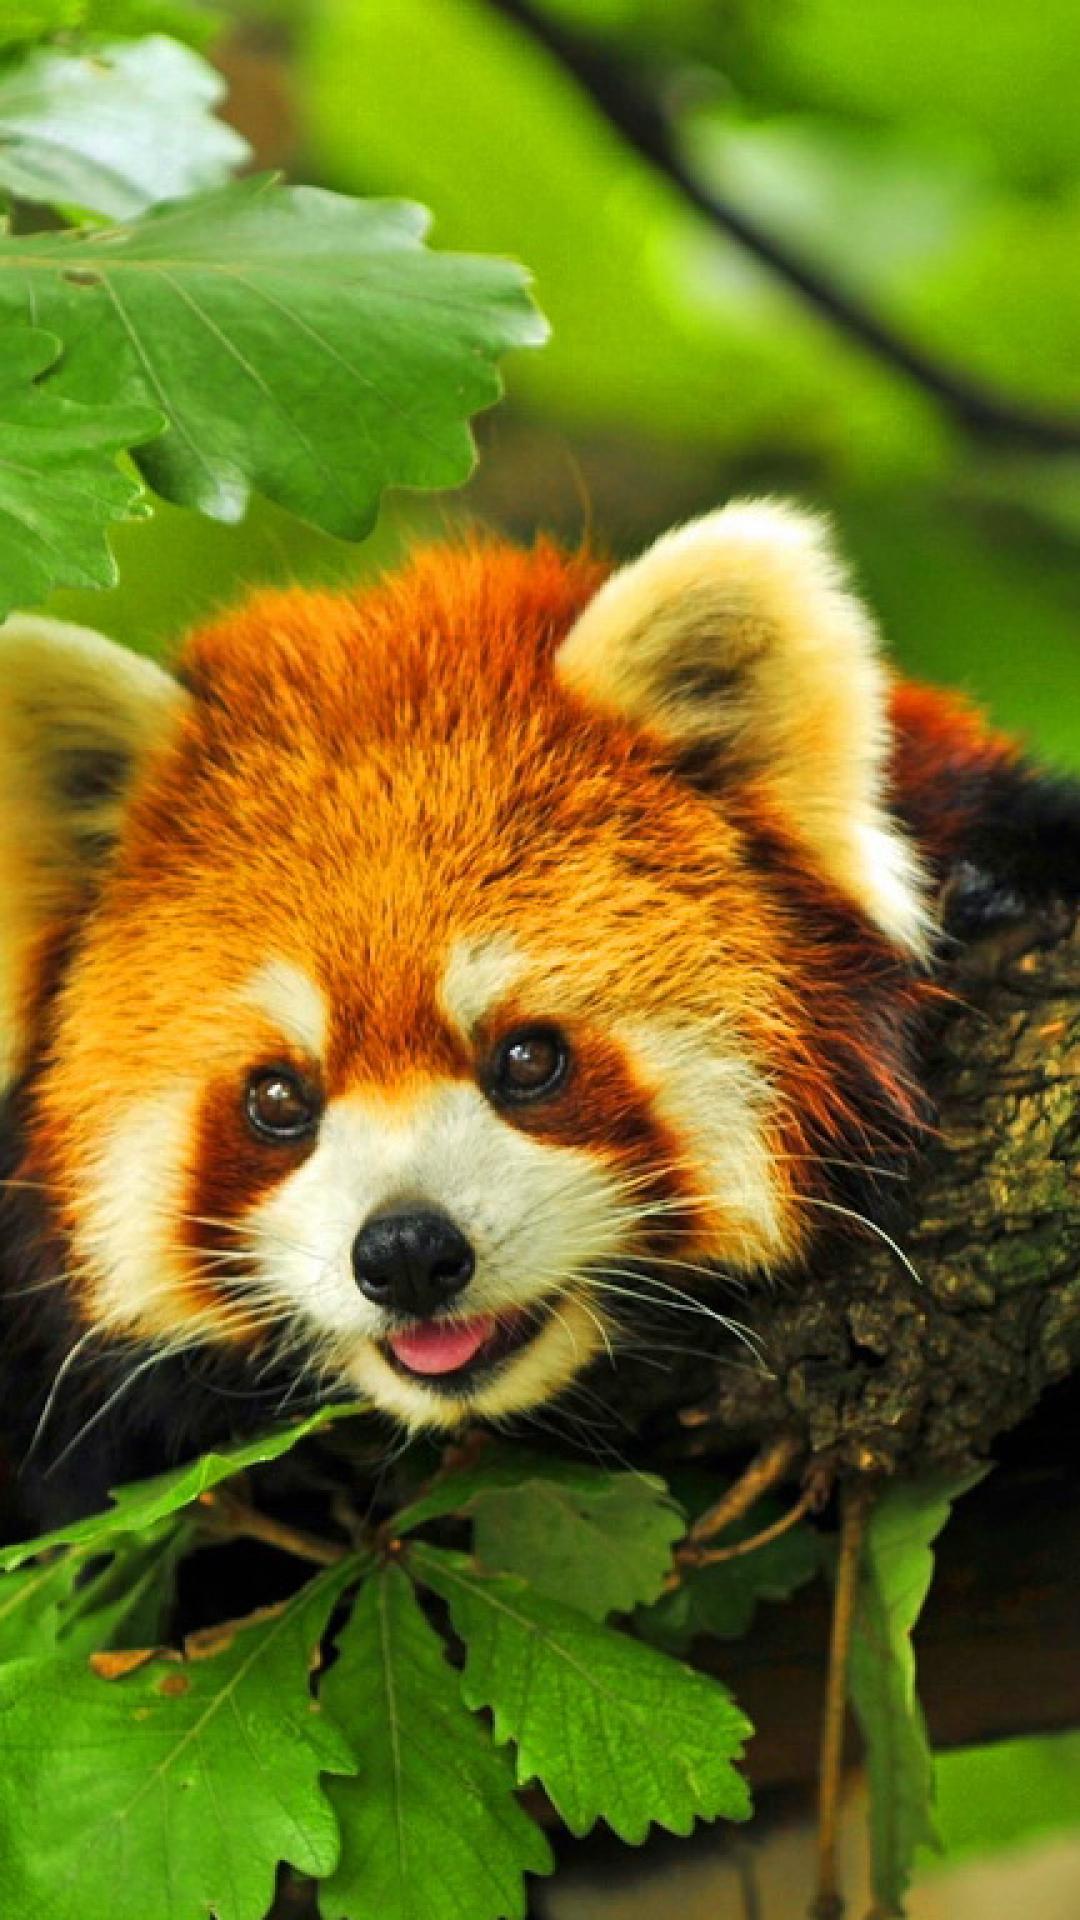 Cute Red Panda Wallpaper - WallpaperSafari | 1080 x 1920 jpeg 223kB